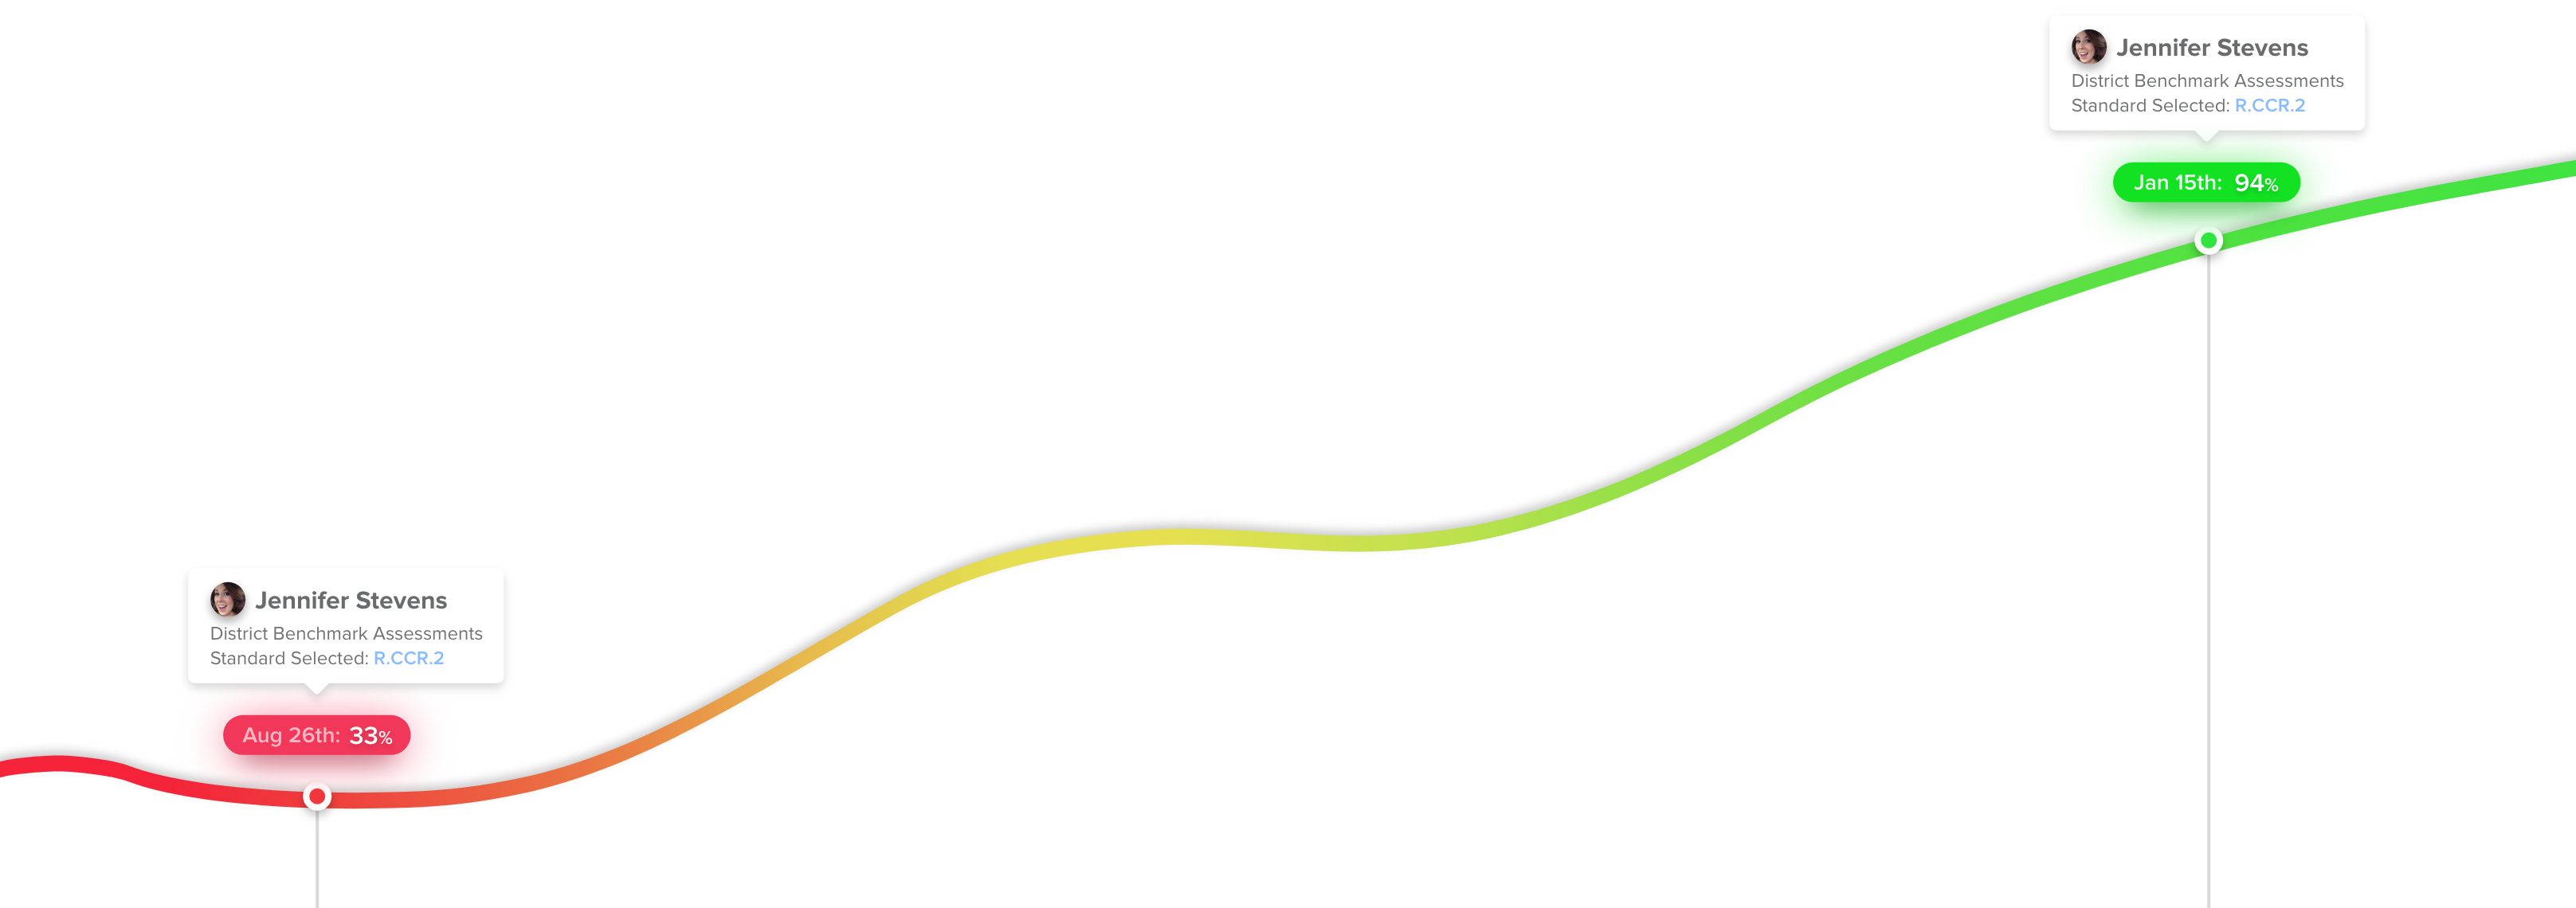 growth-line